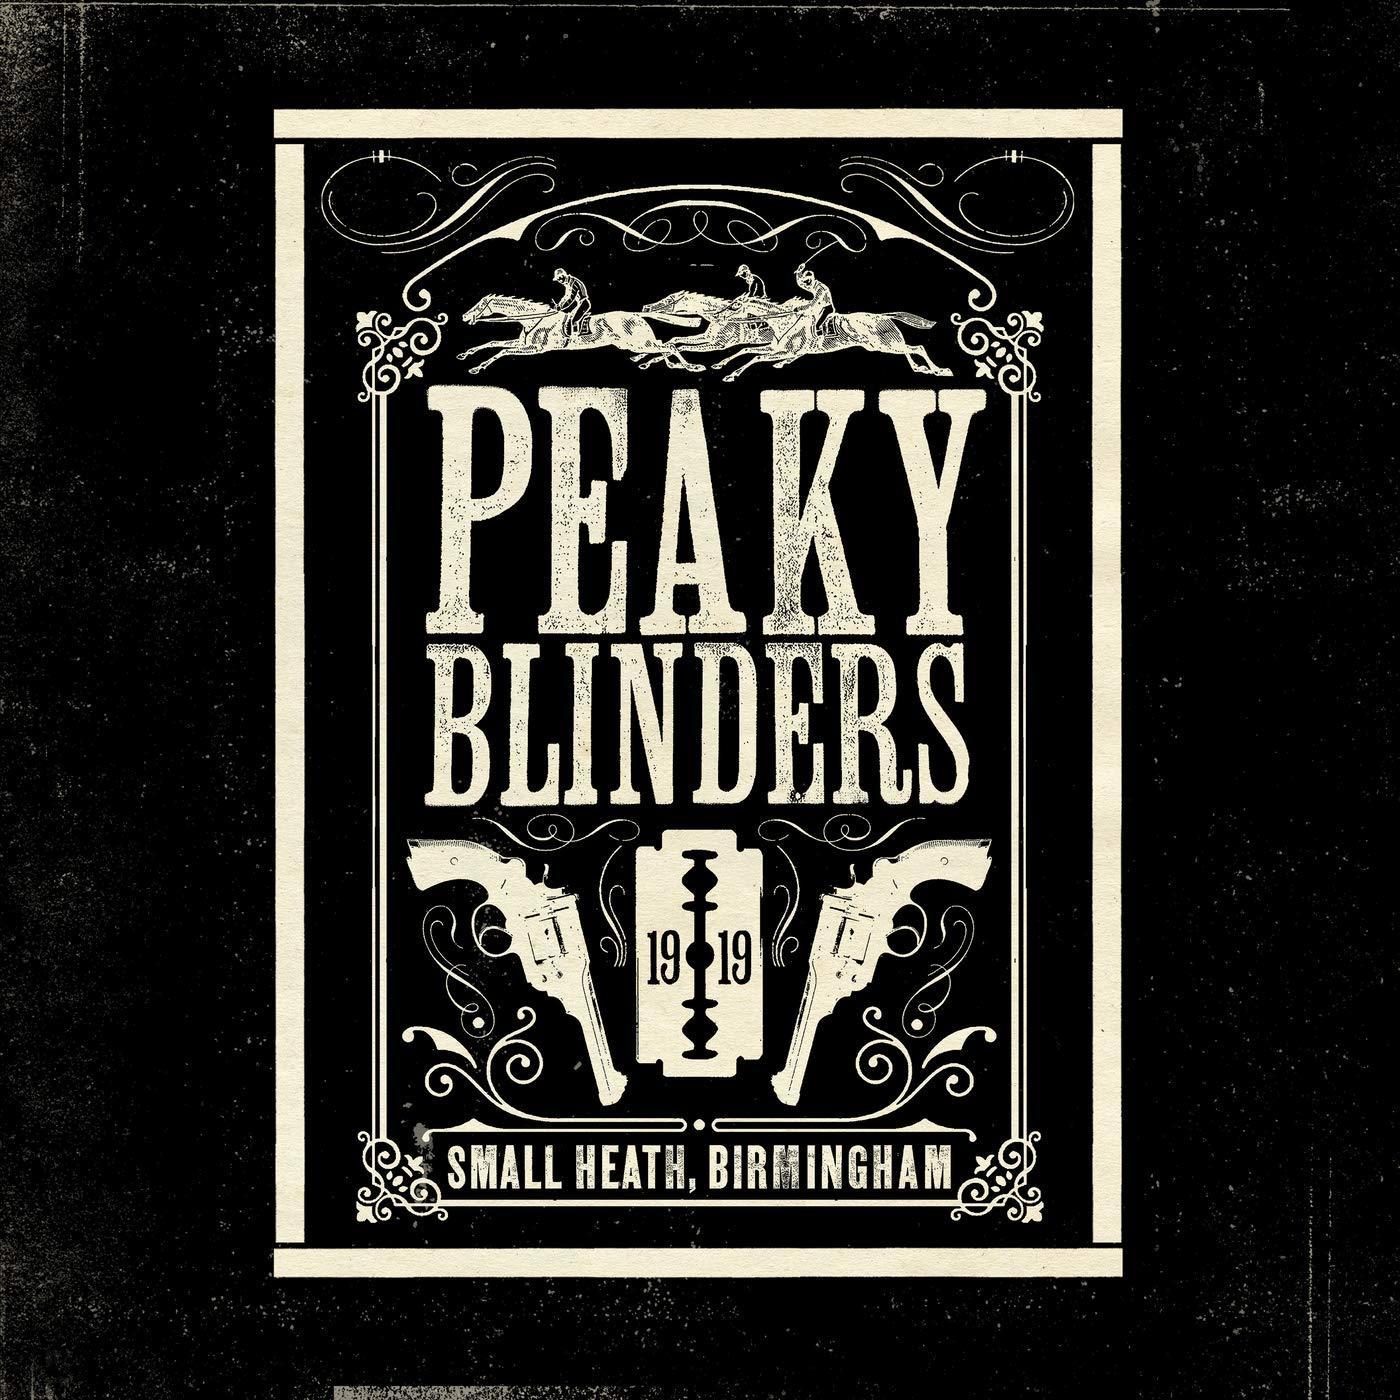 Peaky Blinders - Original Music From The TV Series image